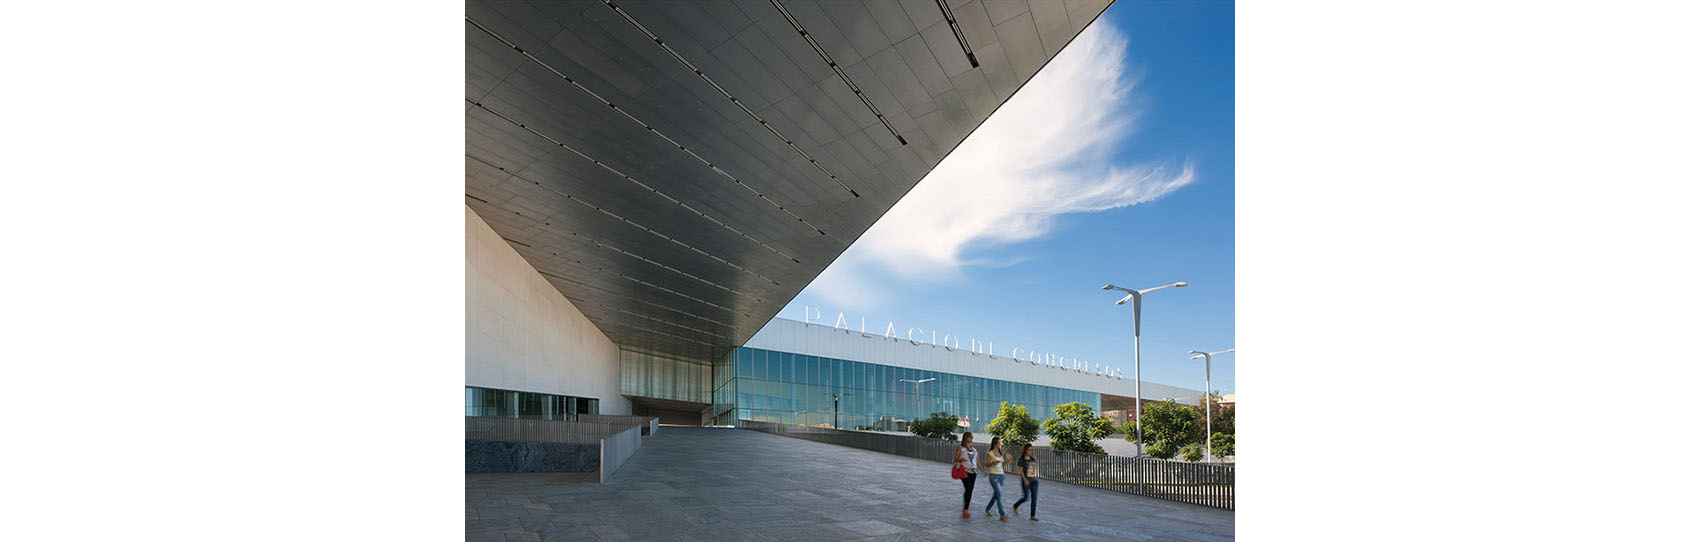 Palacio de Congresos, Sevilla